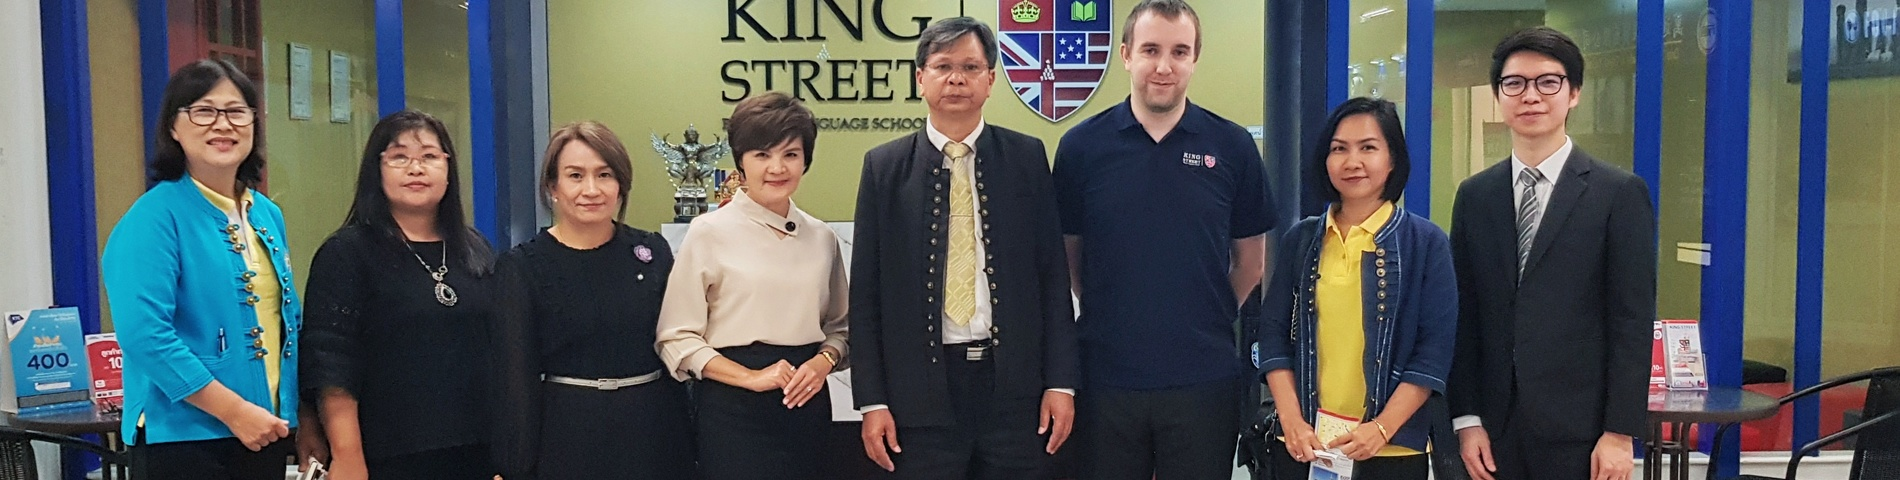 King Street English Language School kuva 1